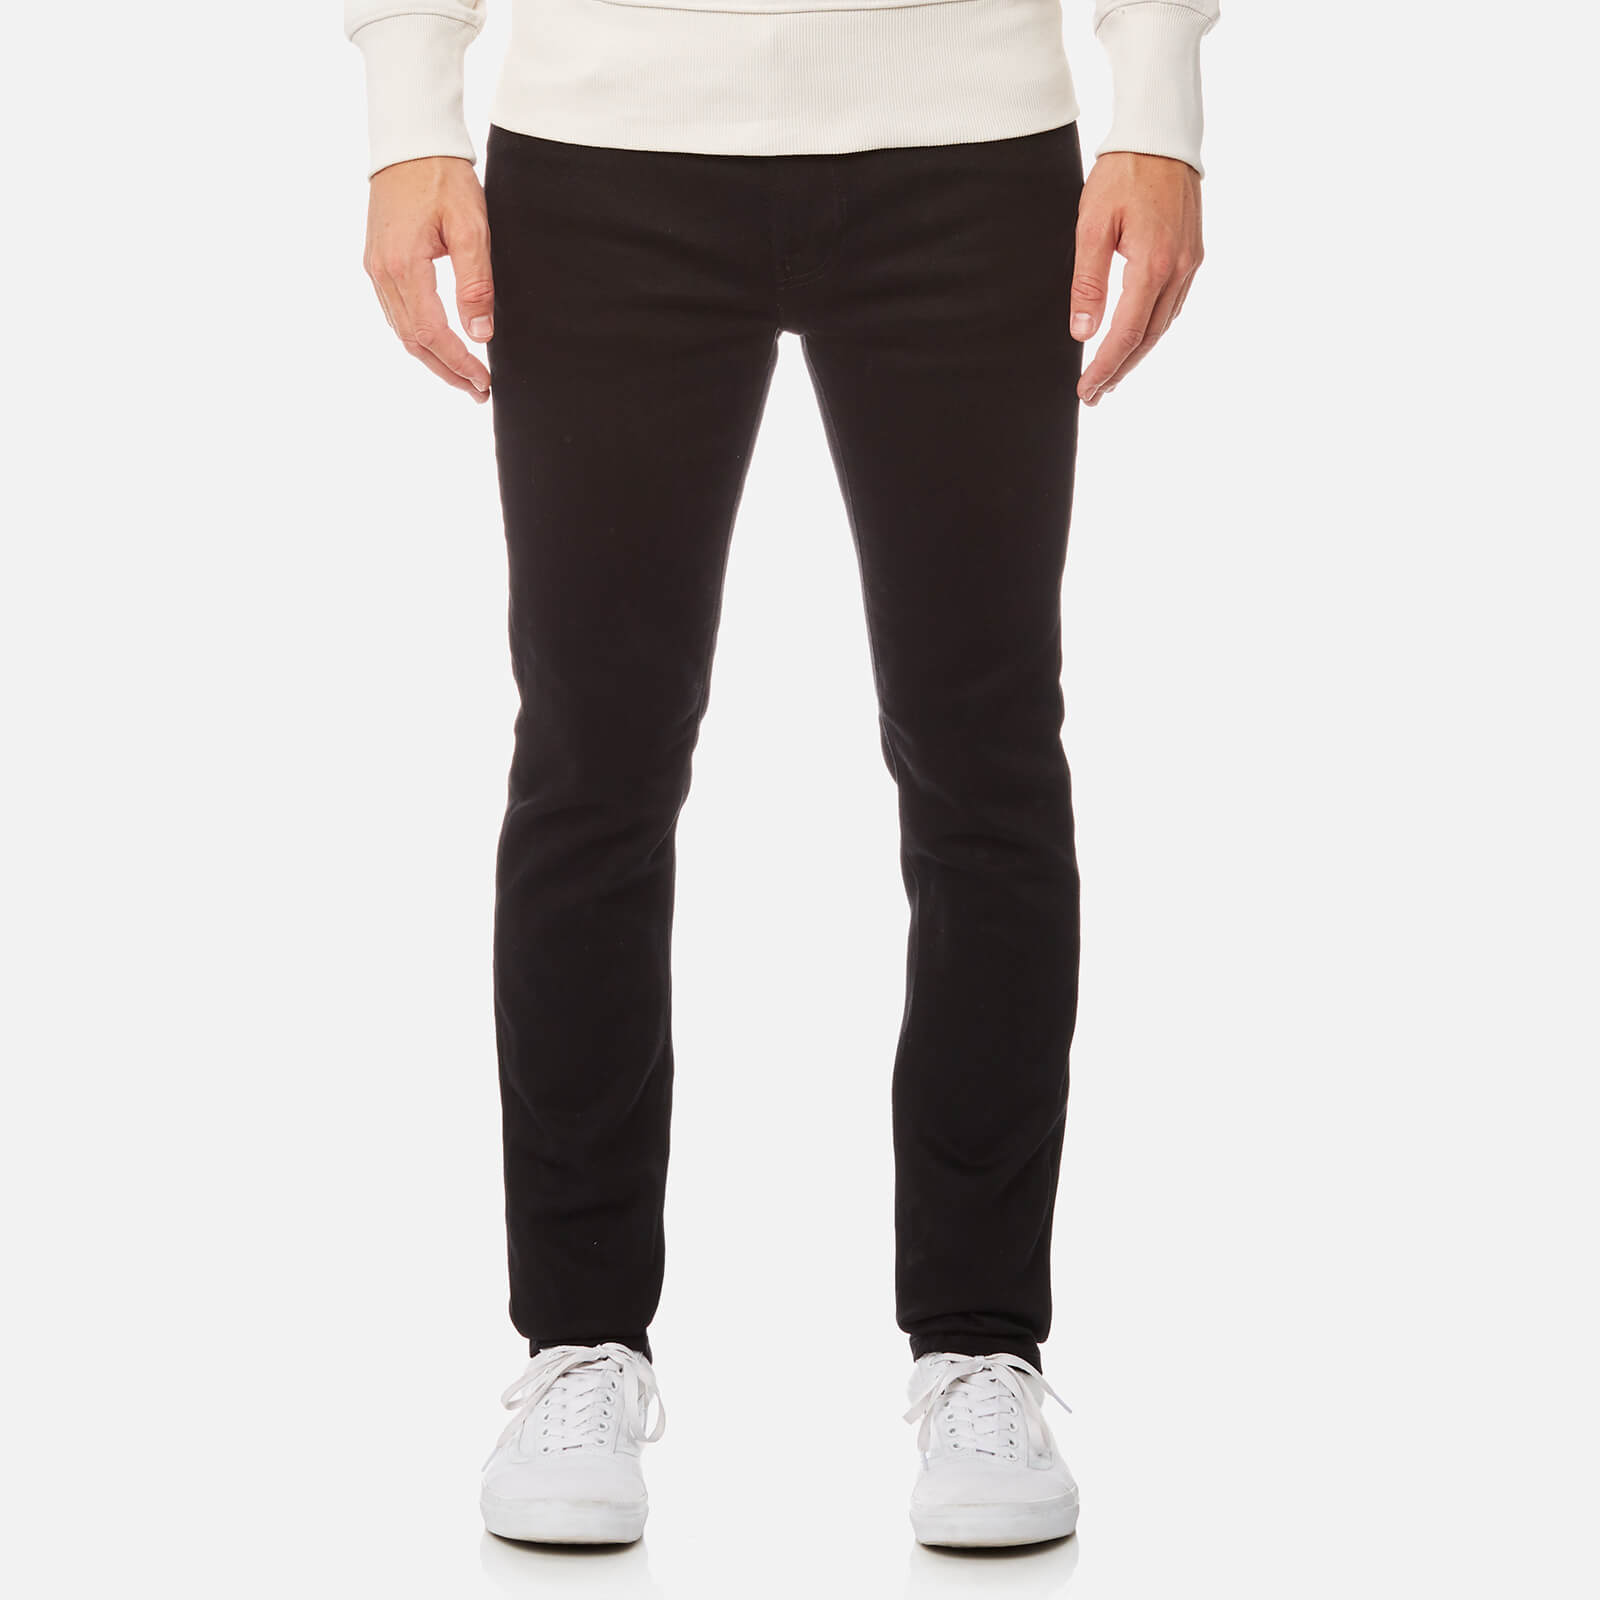 Nudie Jeans Men s Lean Dean Tapered Jeans - Dry Ever Black 59fc5fb90